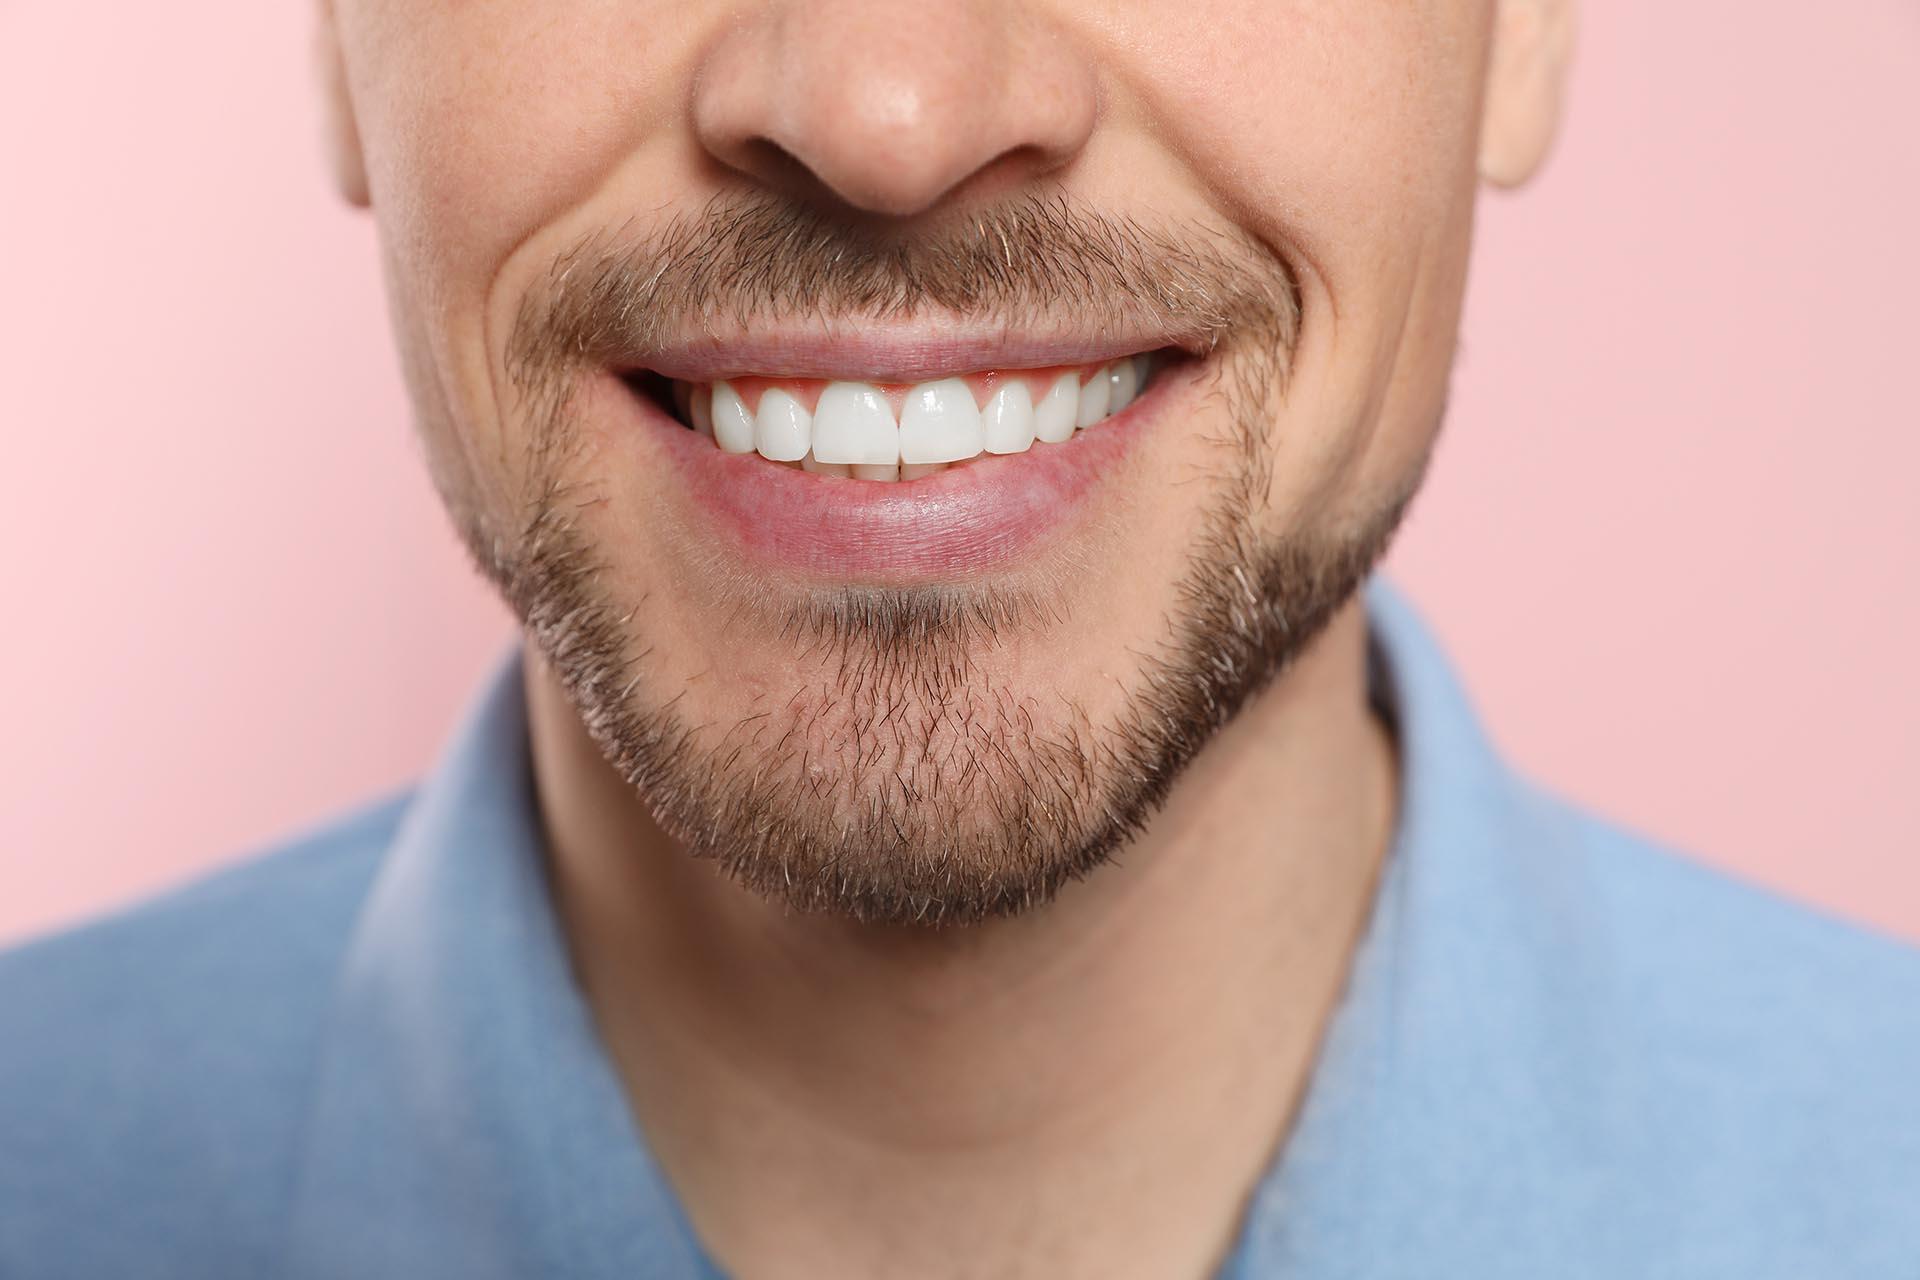 how to enhance your appearance as a man - teeth